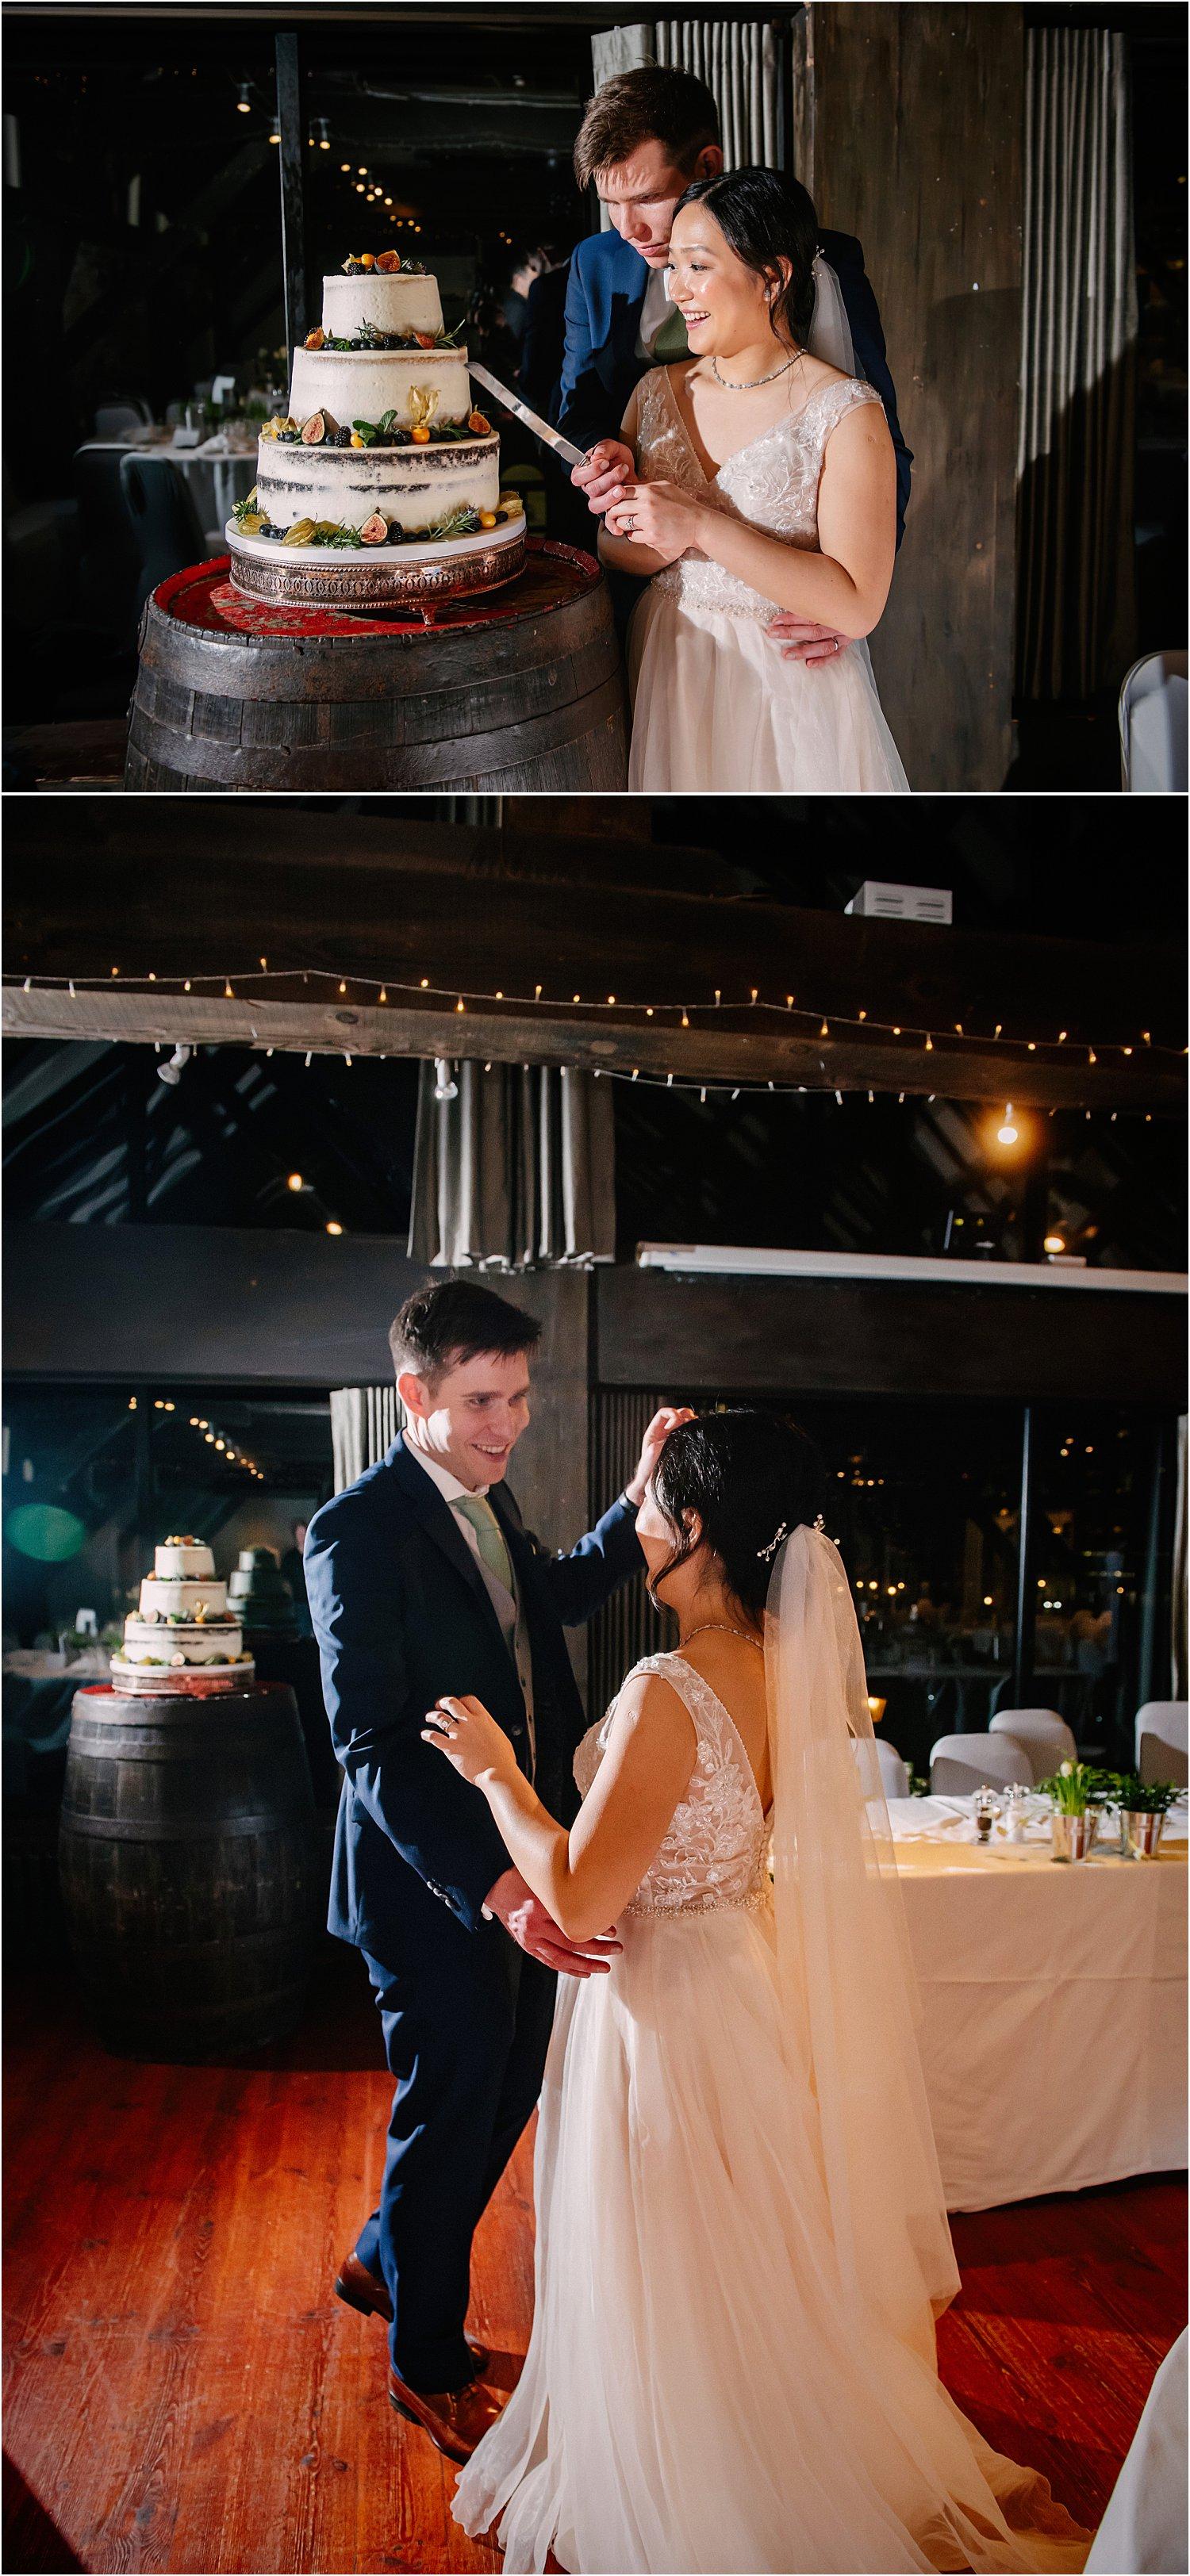 london-wedding-tower-bridge-dickens-inn-yunni-josh-lily-sawyer-photo